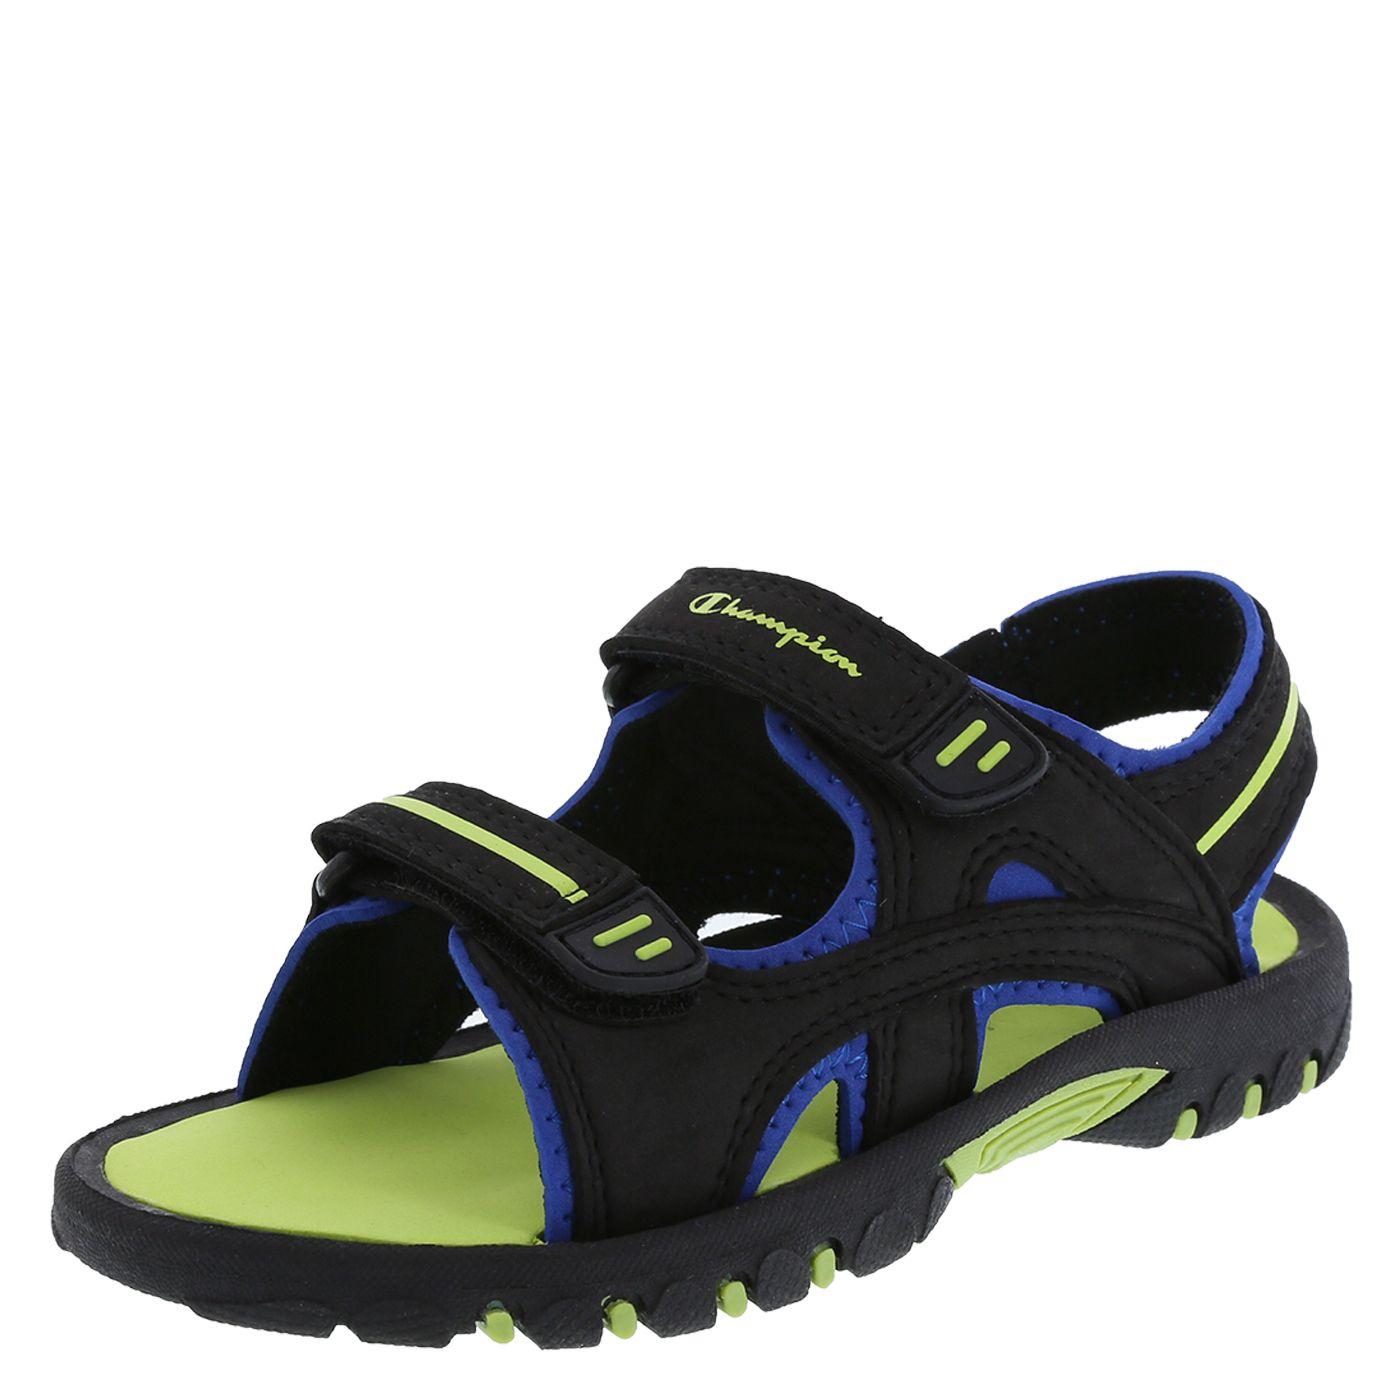 Boys' Double Strap Sport Sandal | Sport